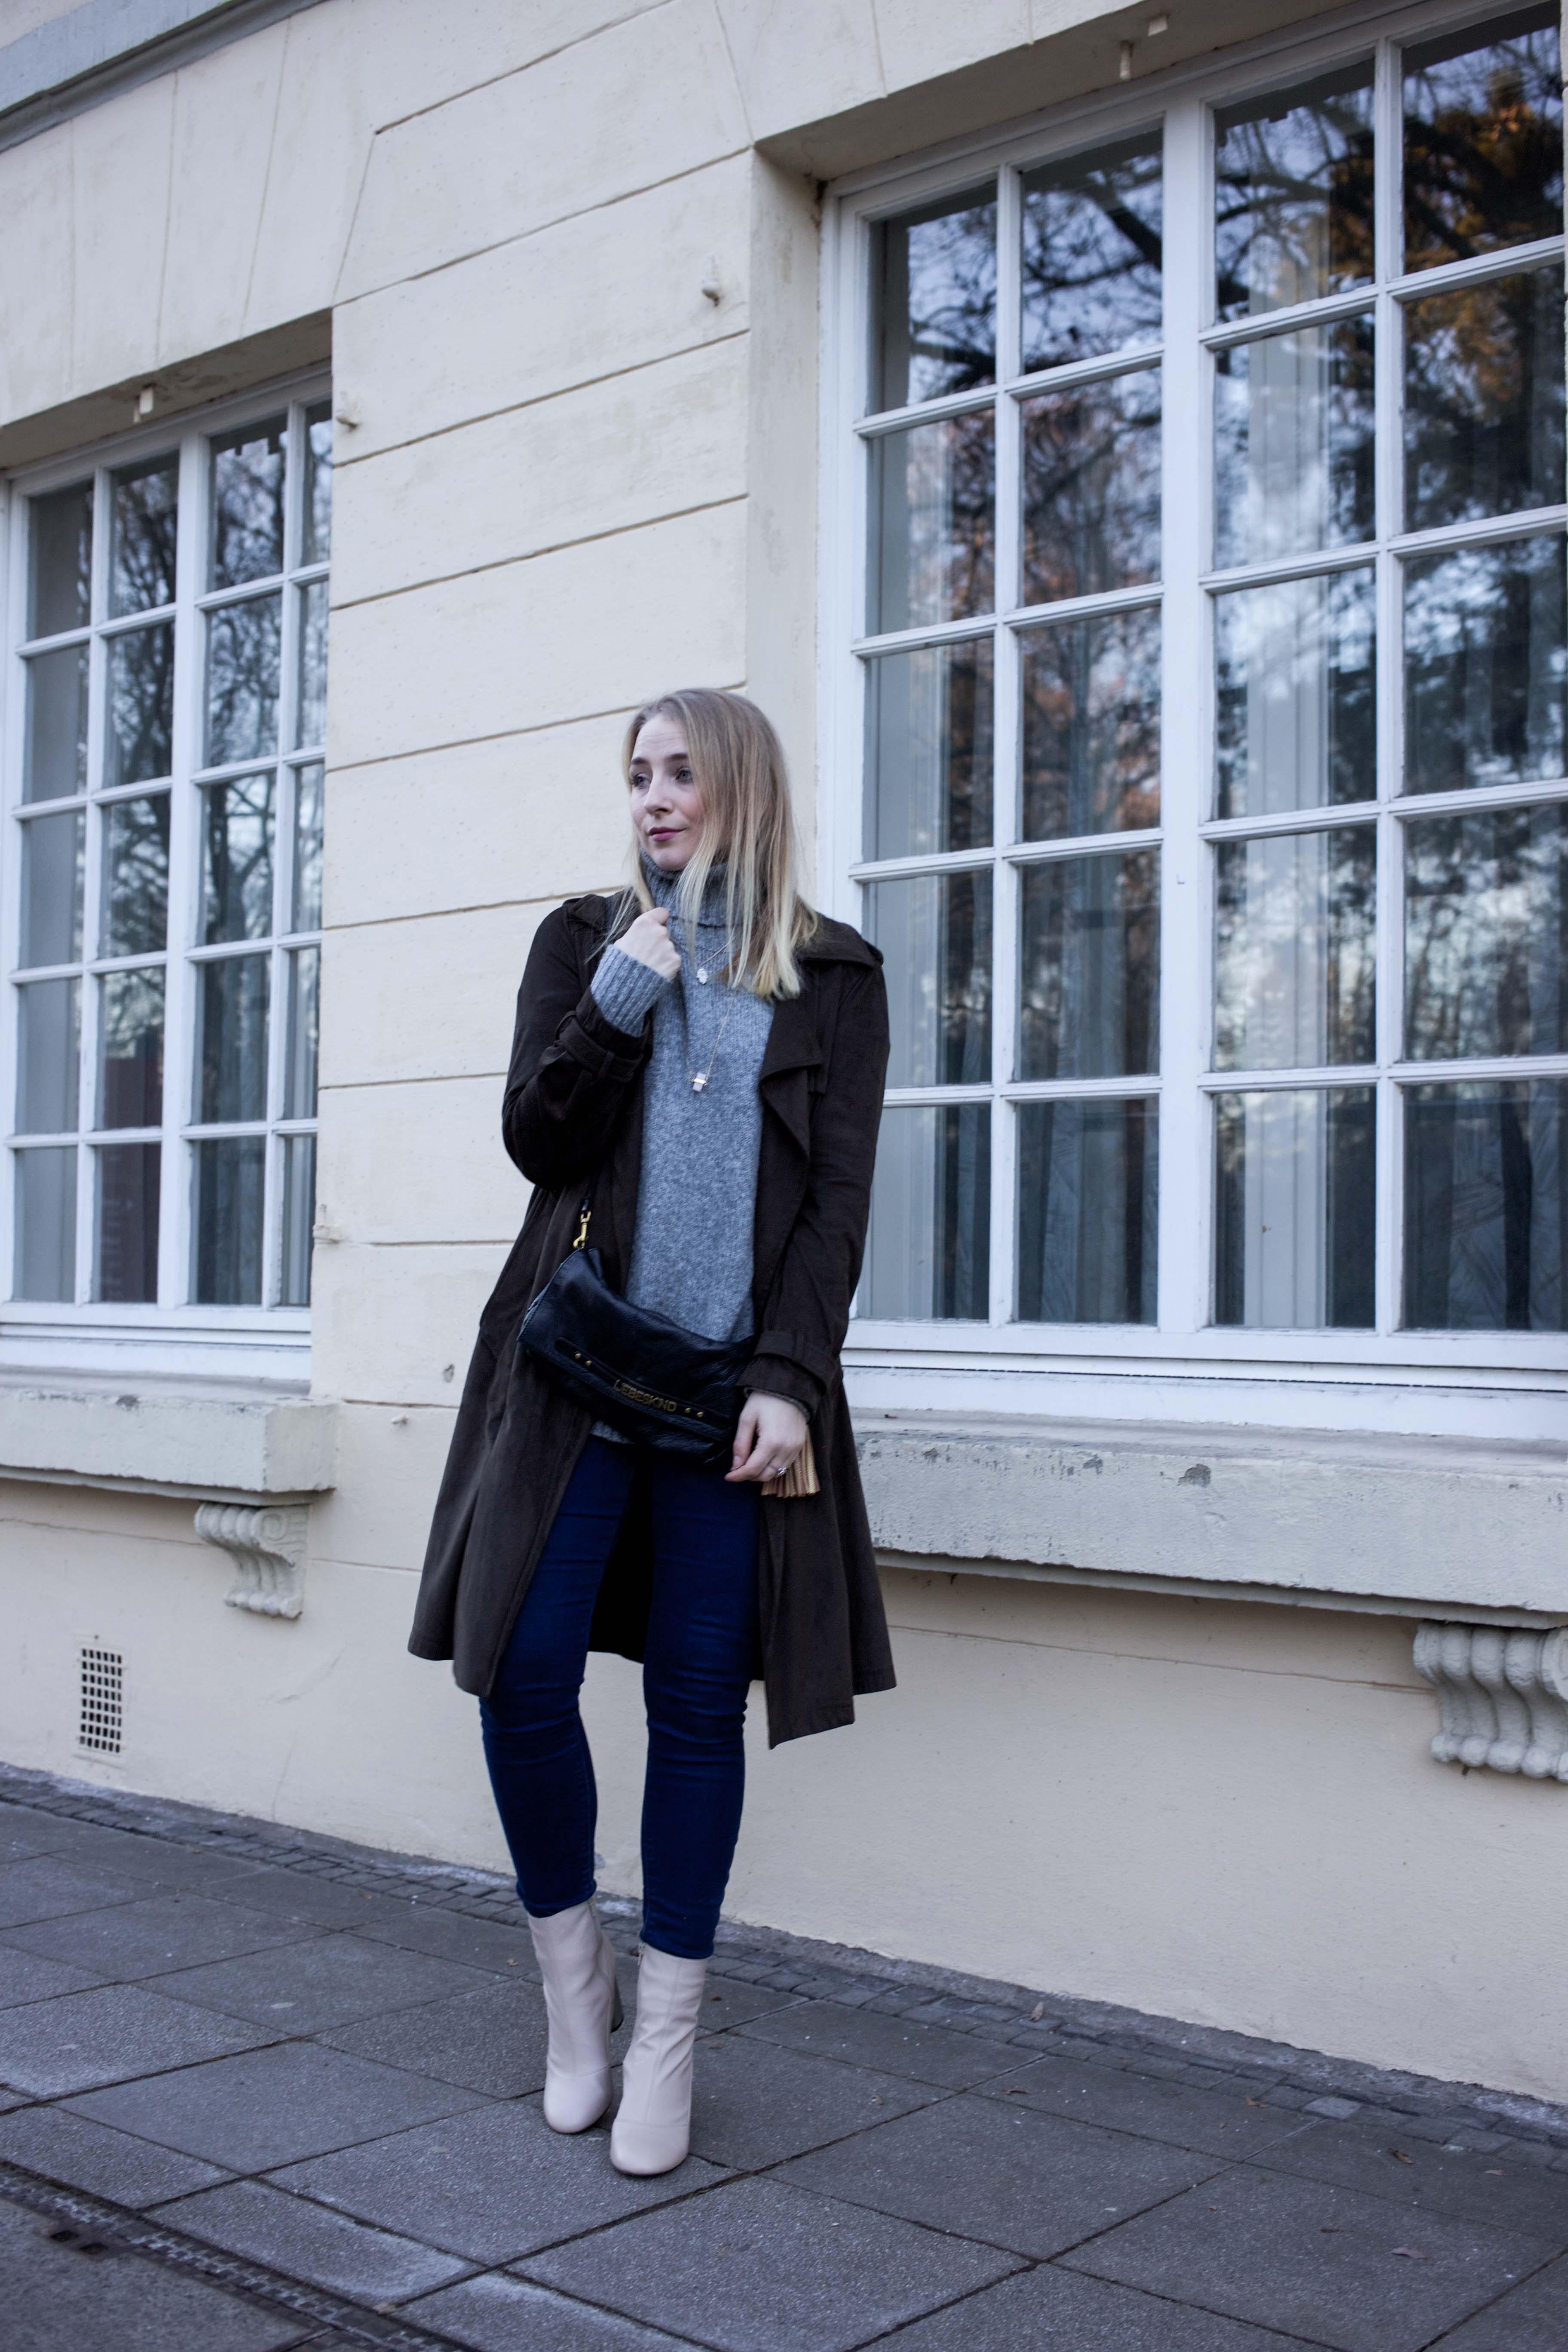 turtleneck-trench-coat-streetstyle-modeblog-fashionblog-bonn-berlin-köln-lederstiefel-silberabsatz-outfi_9223